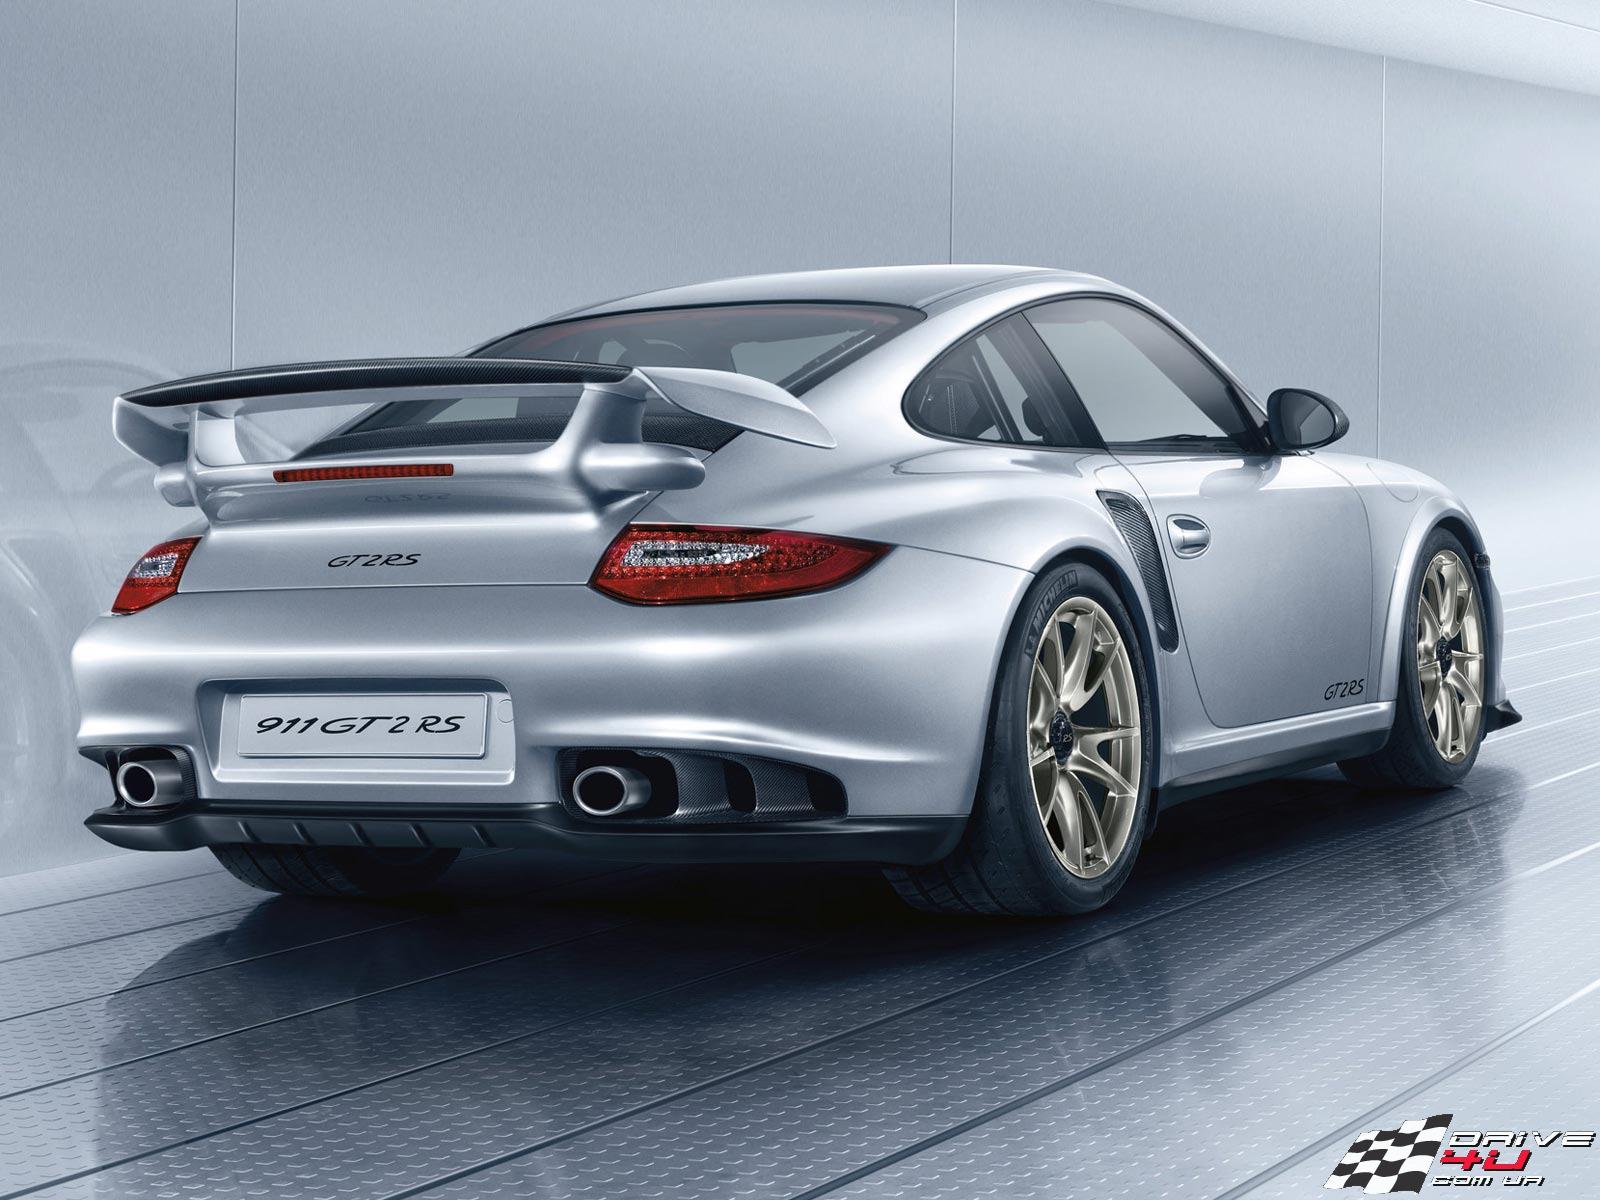 2007 Porsche 911 Gt3 911 Gt3 Rs 911 Turbo Wallpapers 1600x1200